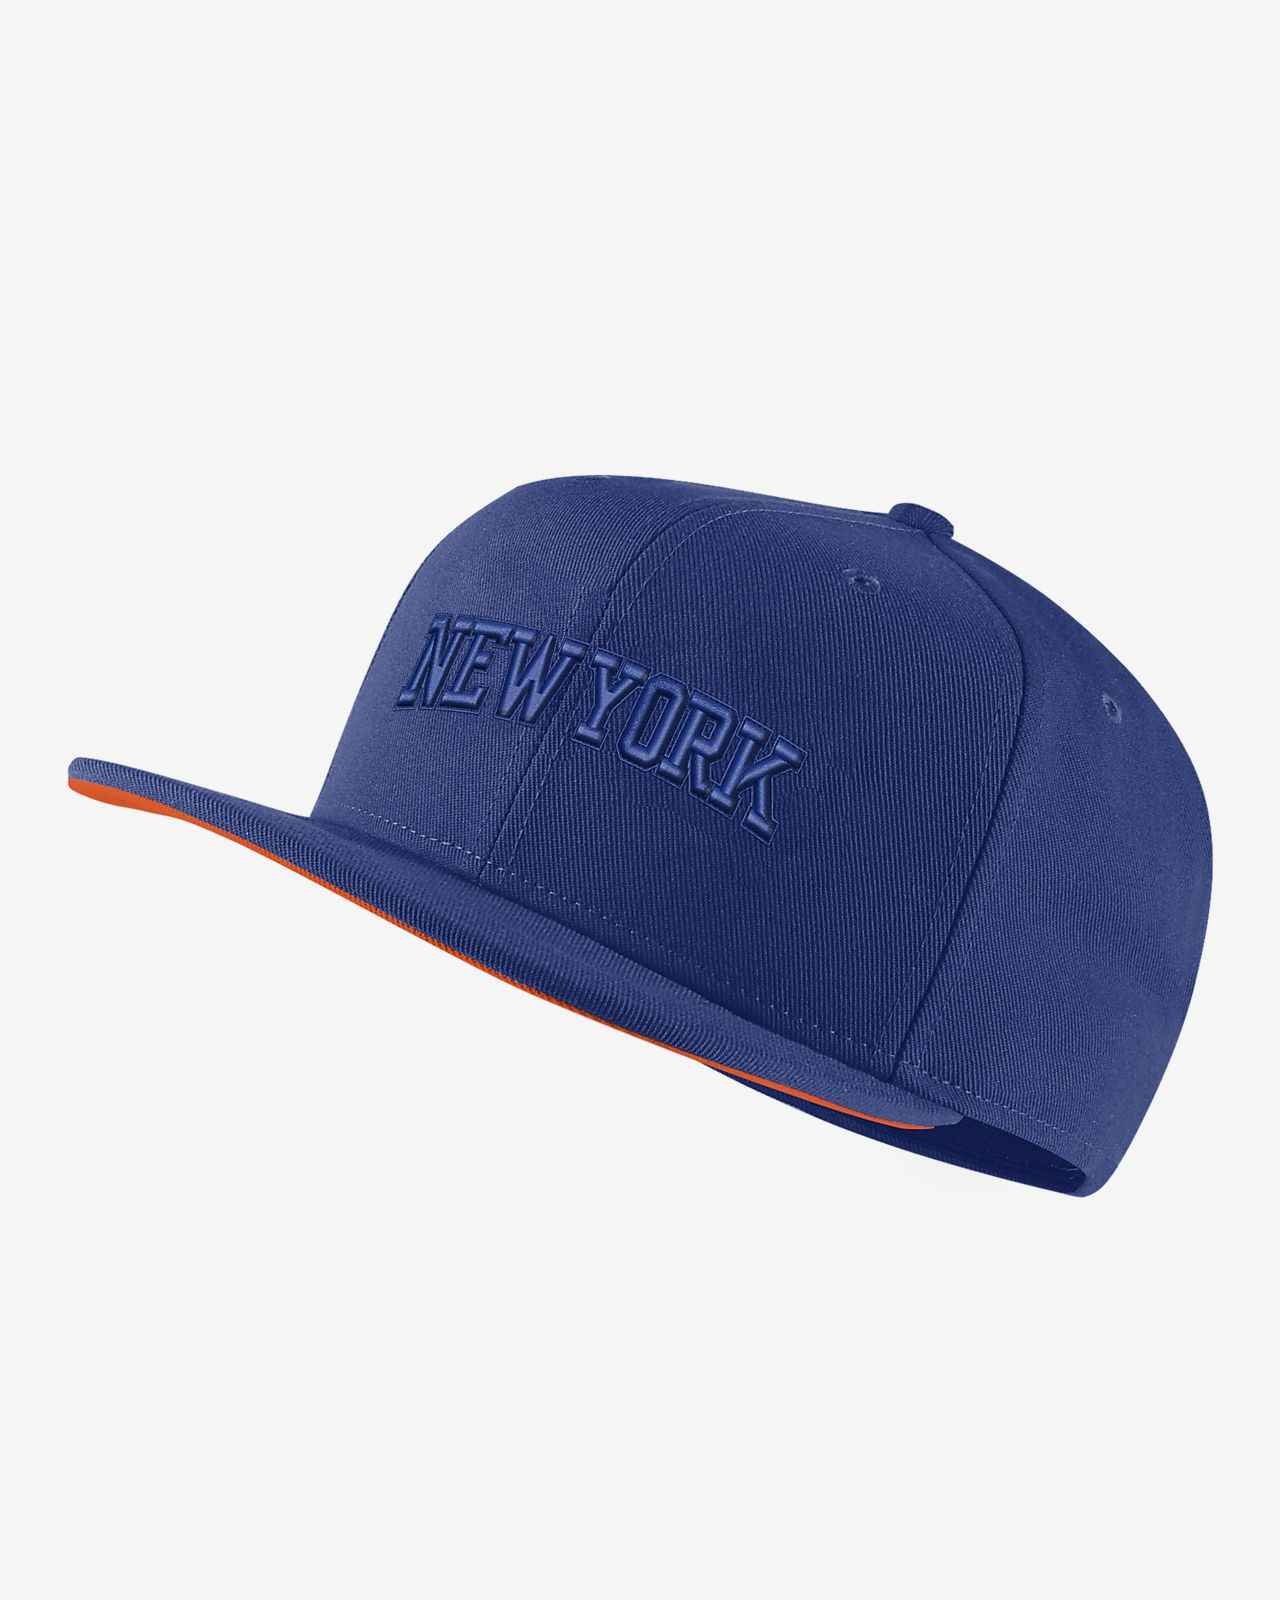 New York Knicks Nike AeroBill NBA-Cap